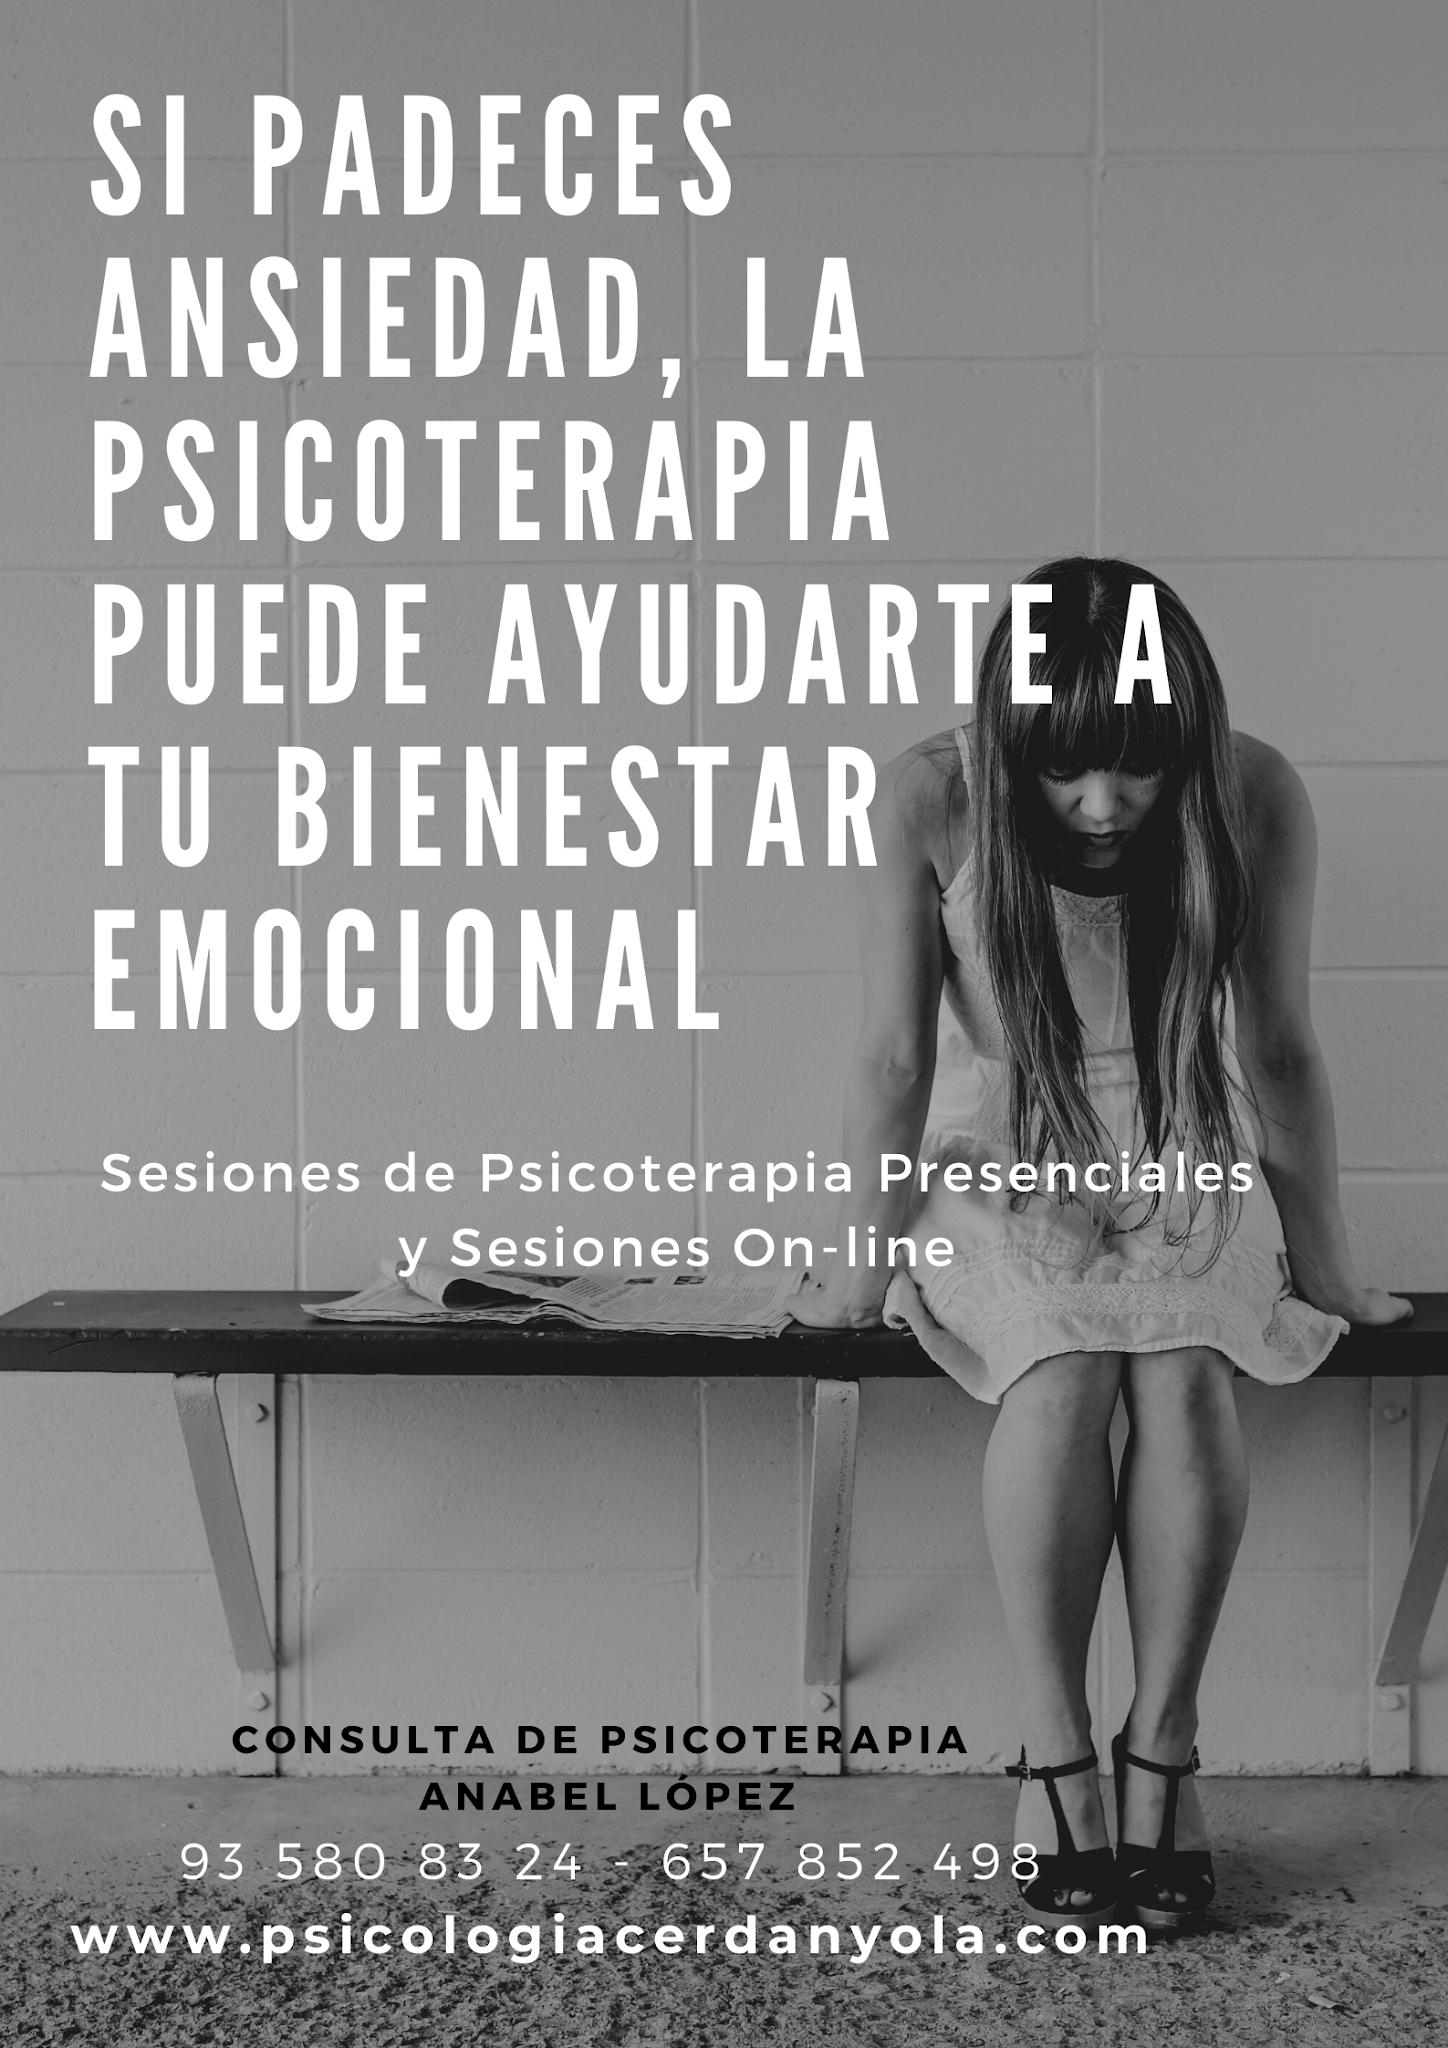 psicoterapia-anabel-lopez